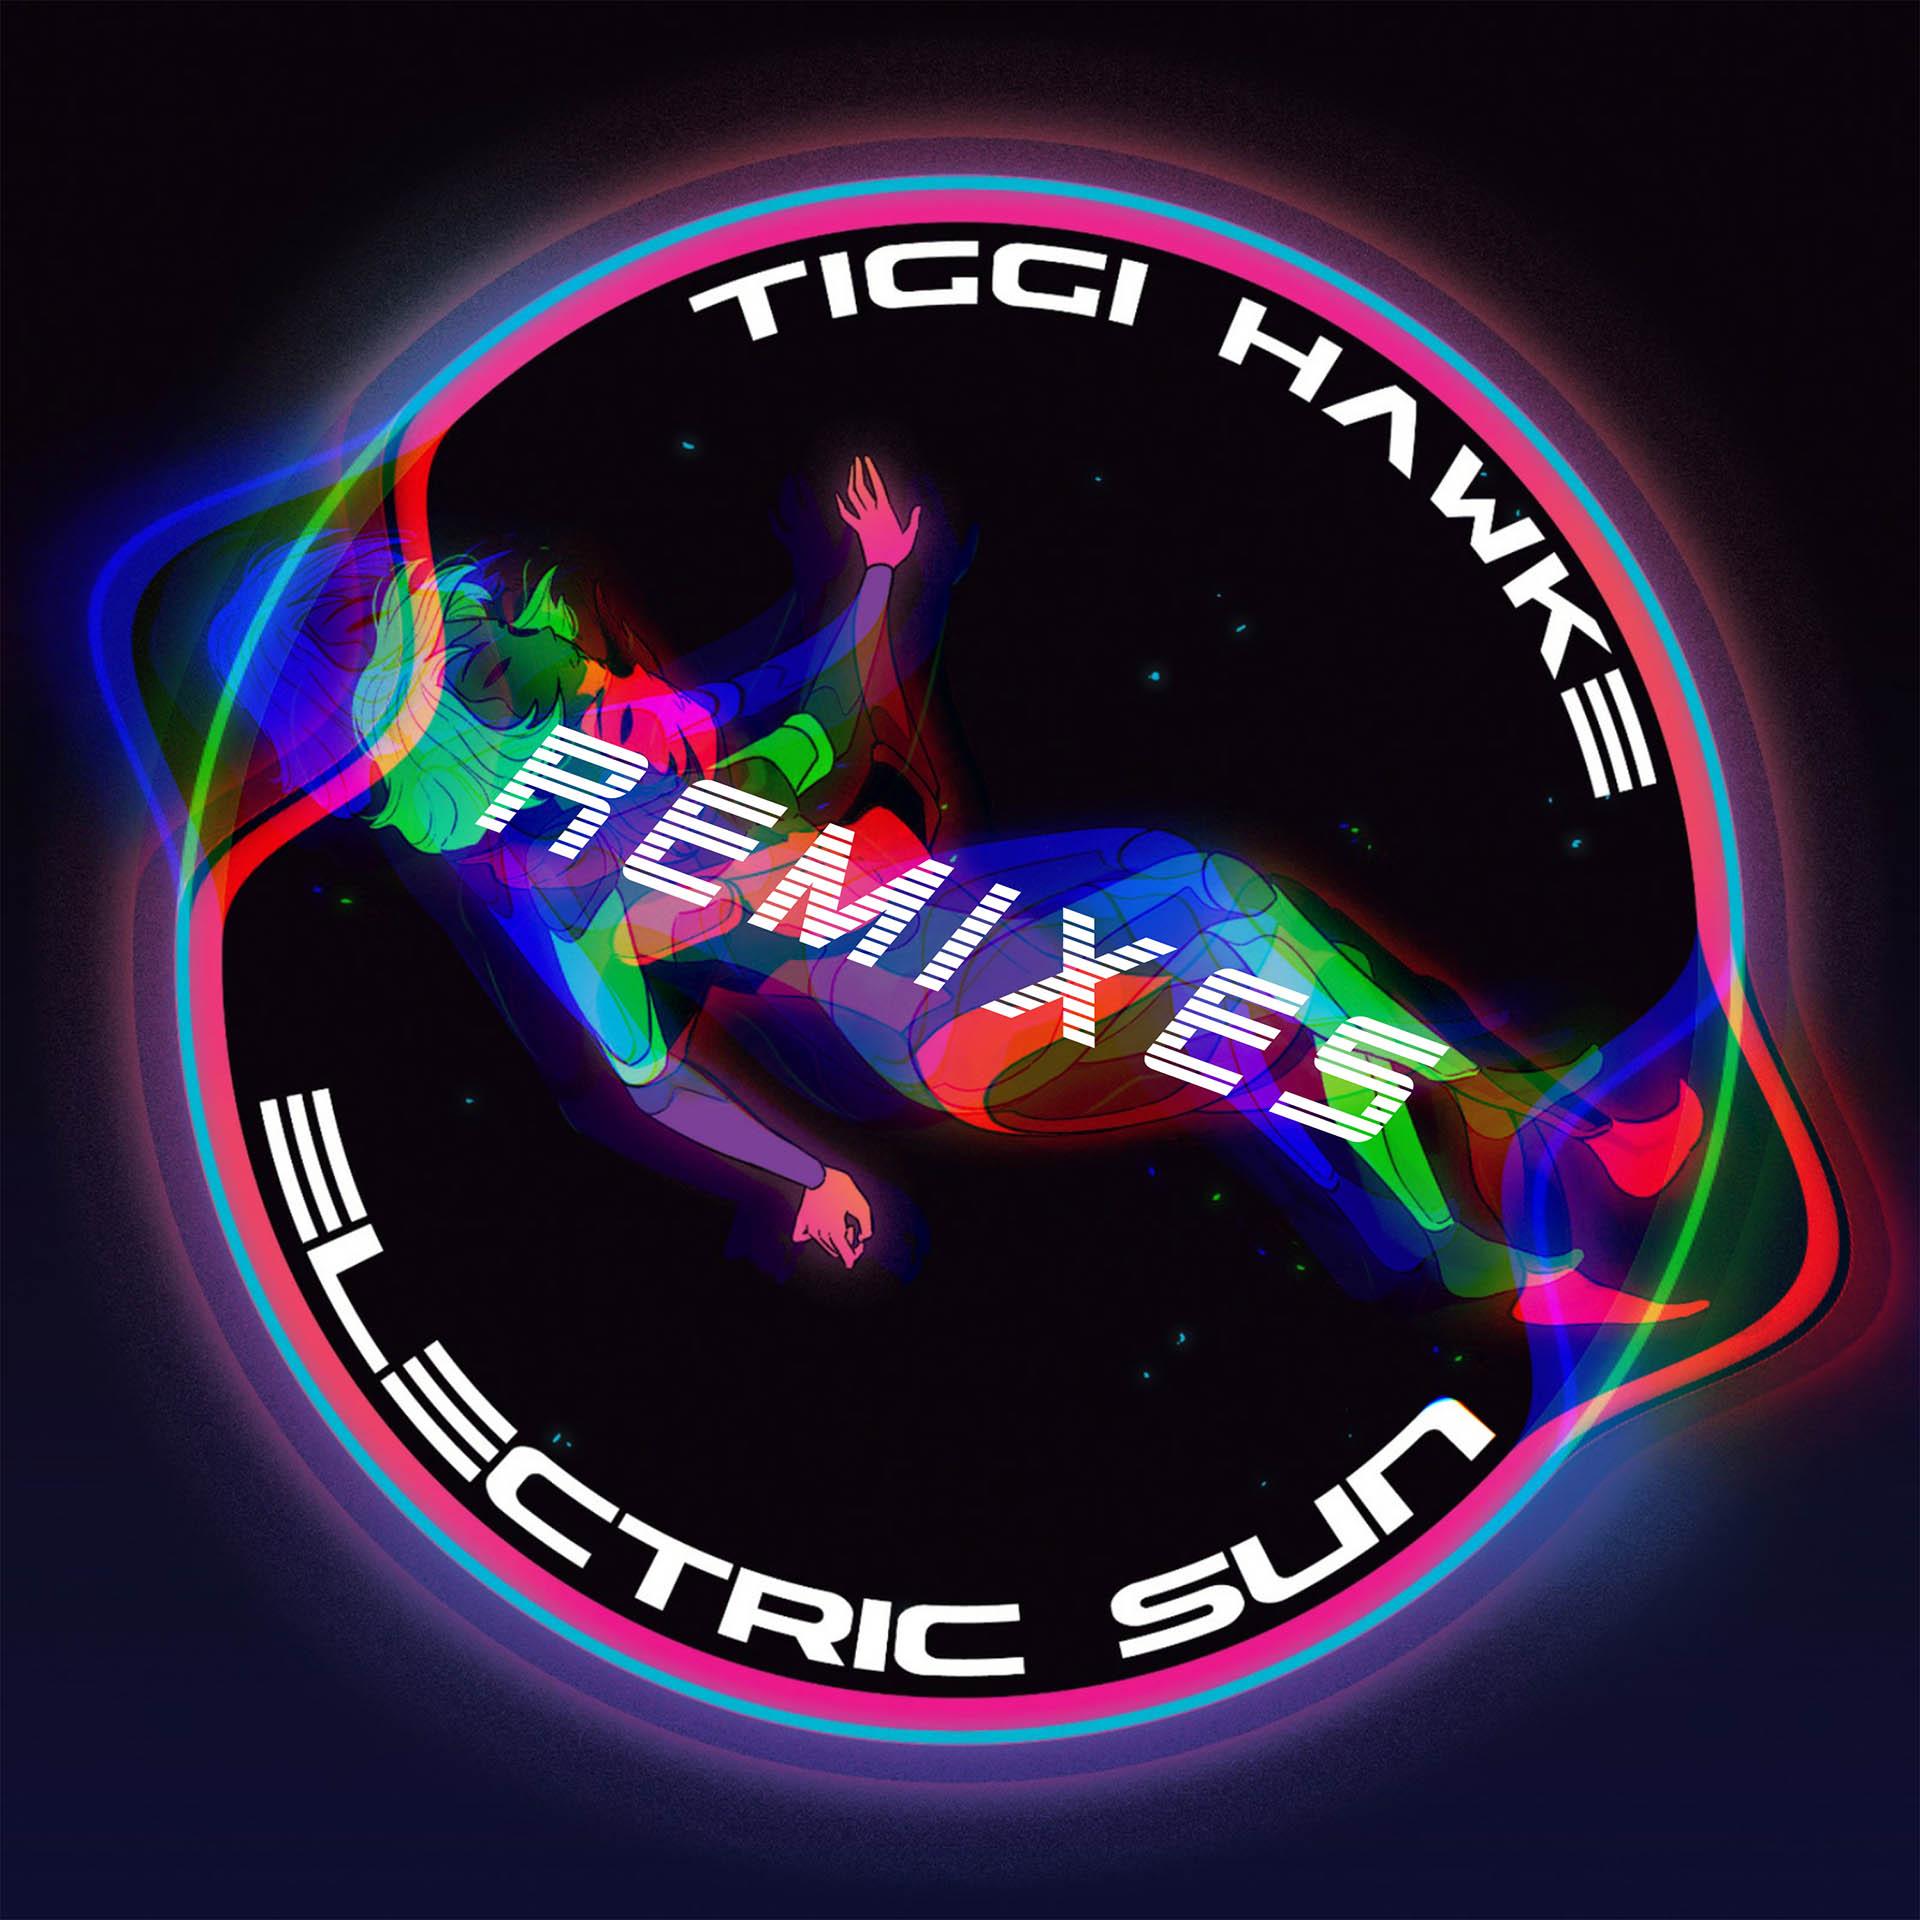 ELECTRIC SUN REMIX - TIGGI HAWK